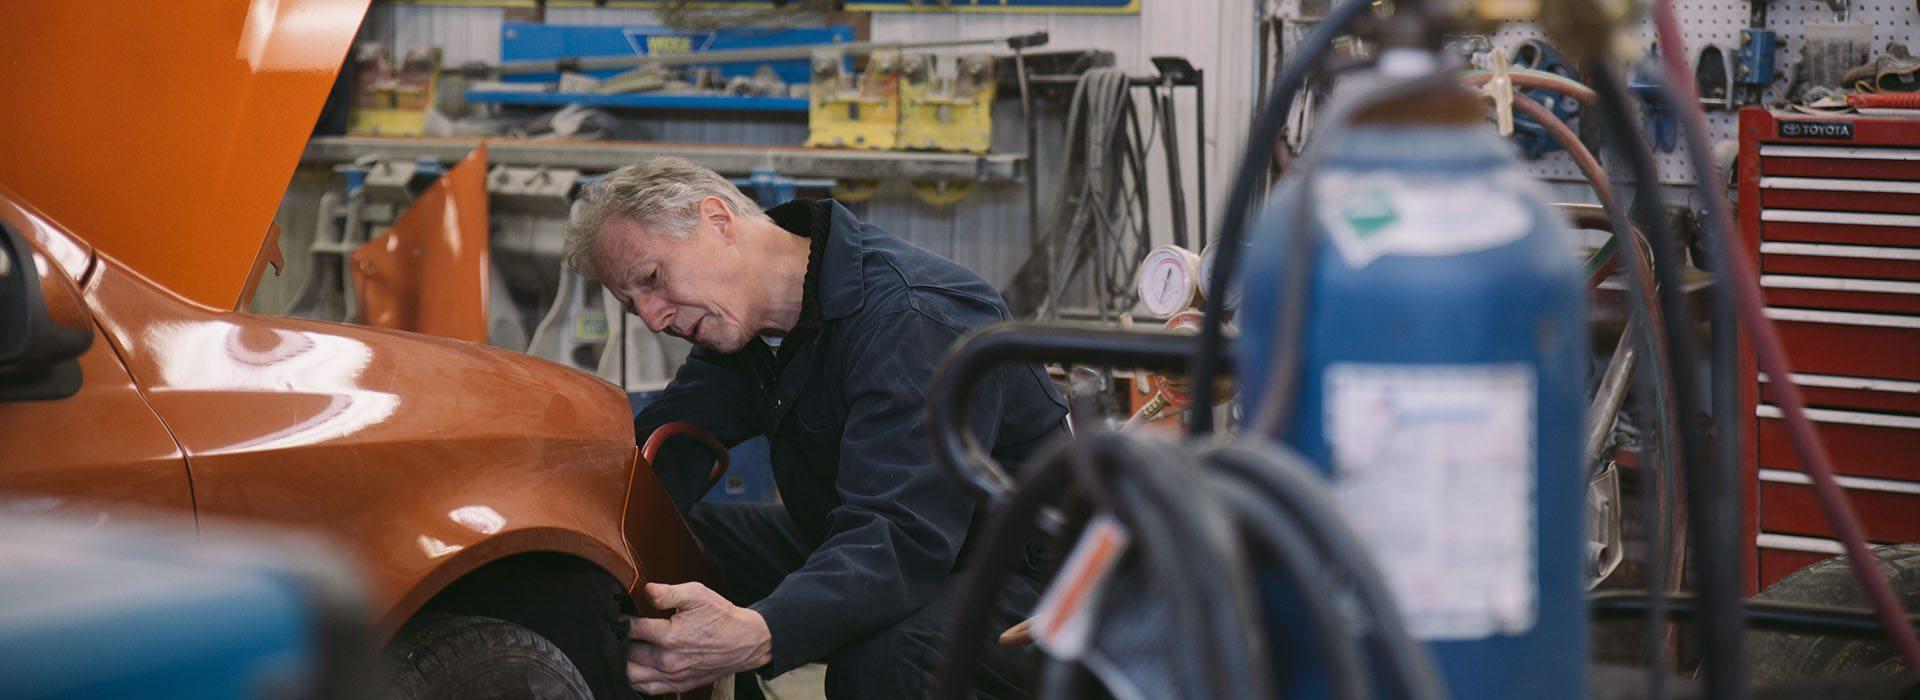 Abbotsford Auto Body Shop and Collision Repair